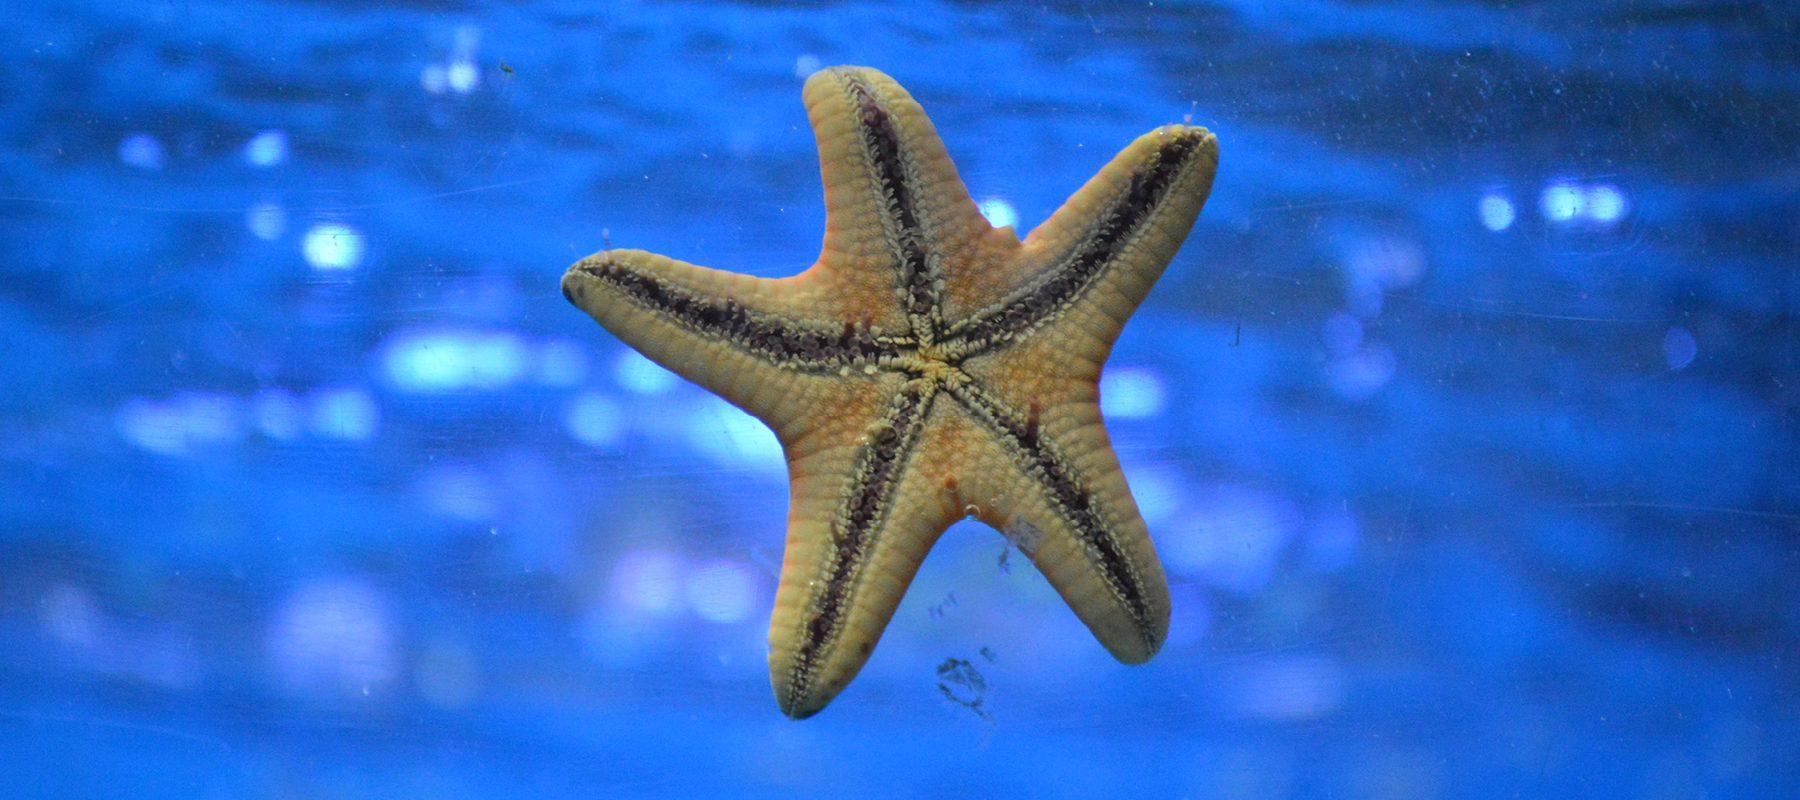 star fish stock image